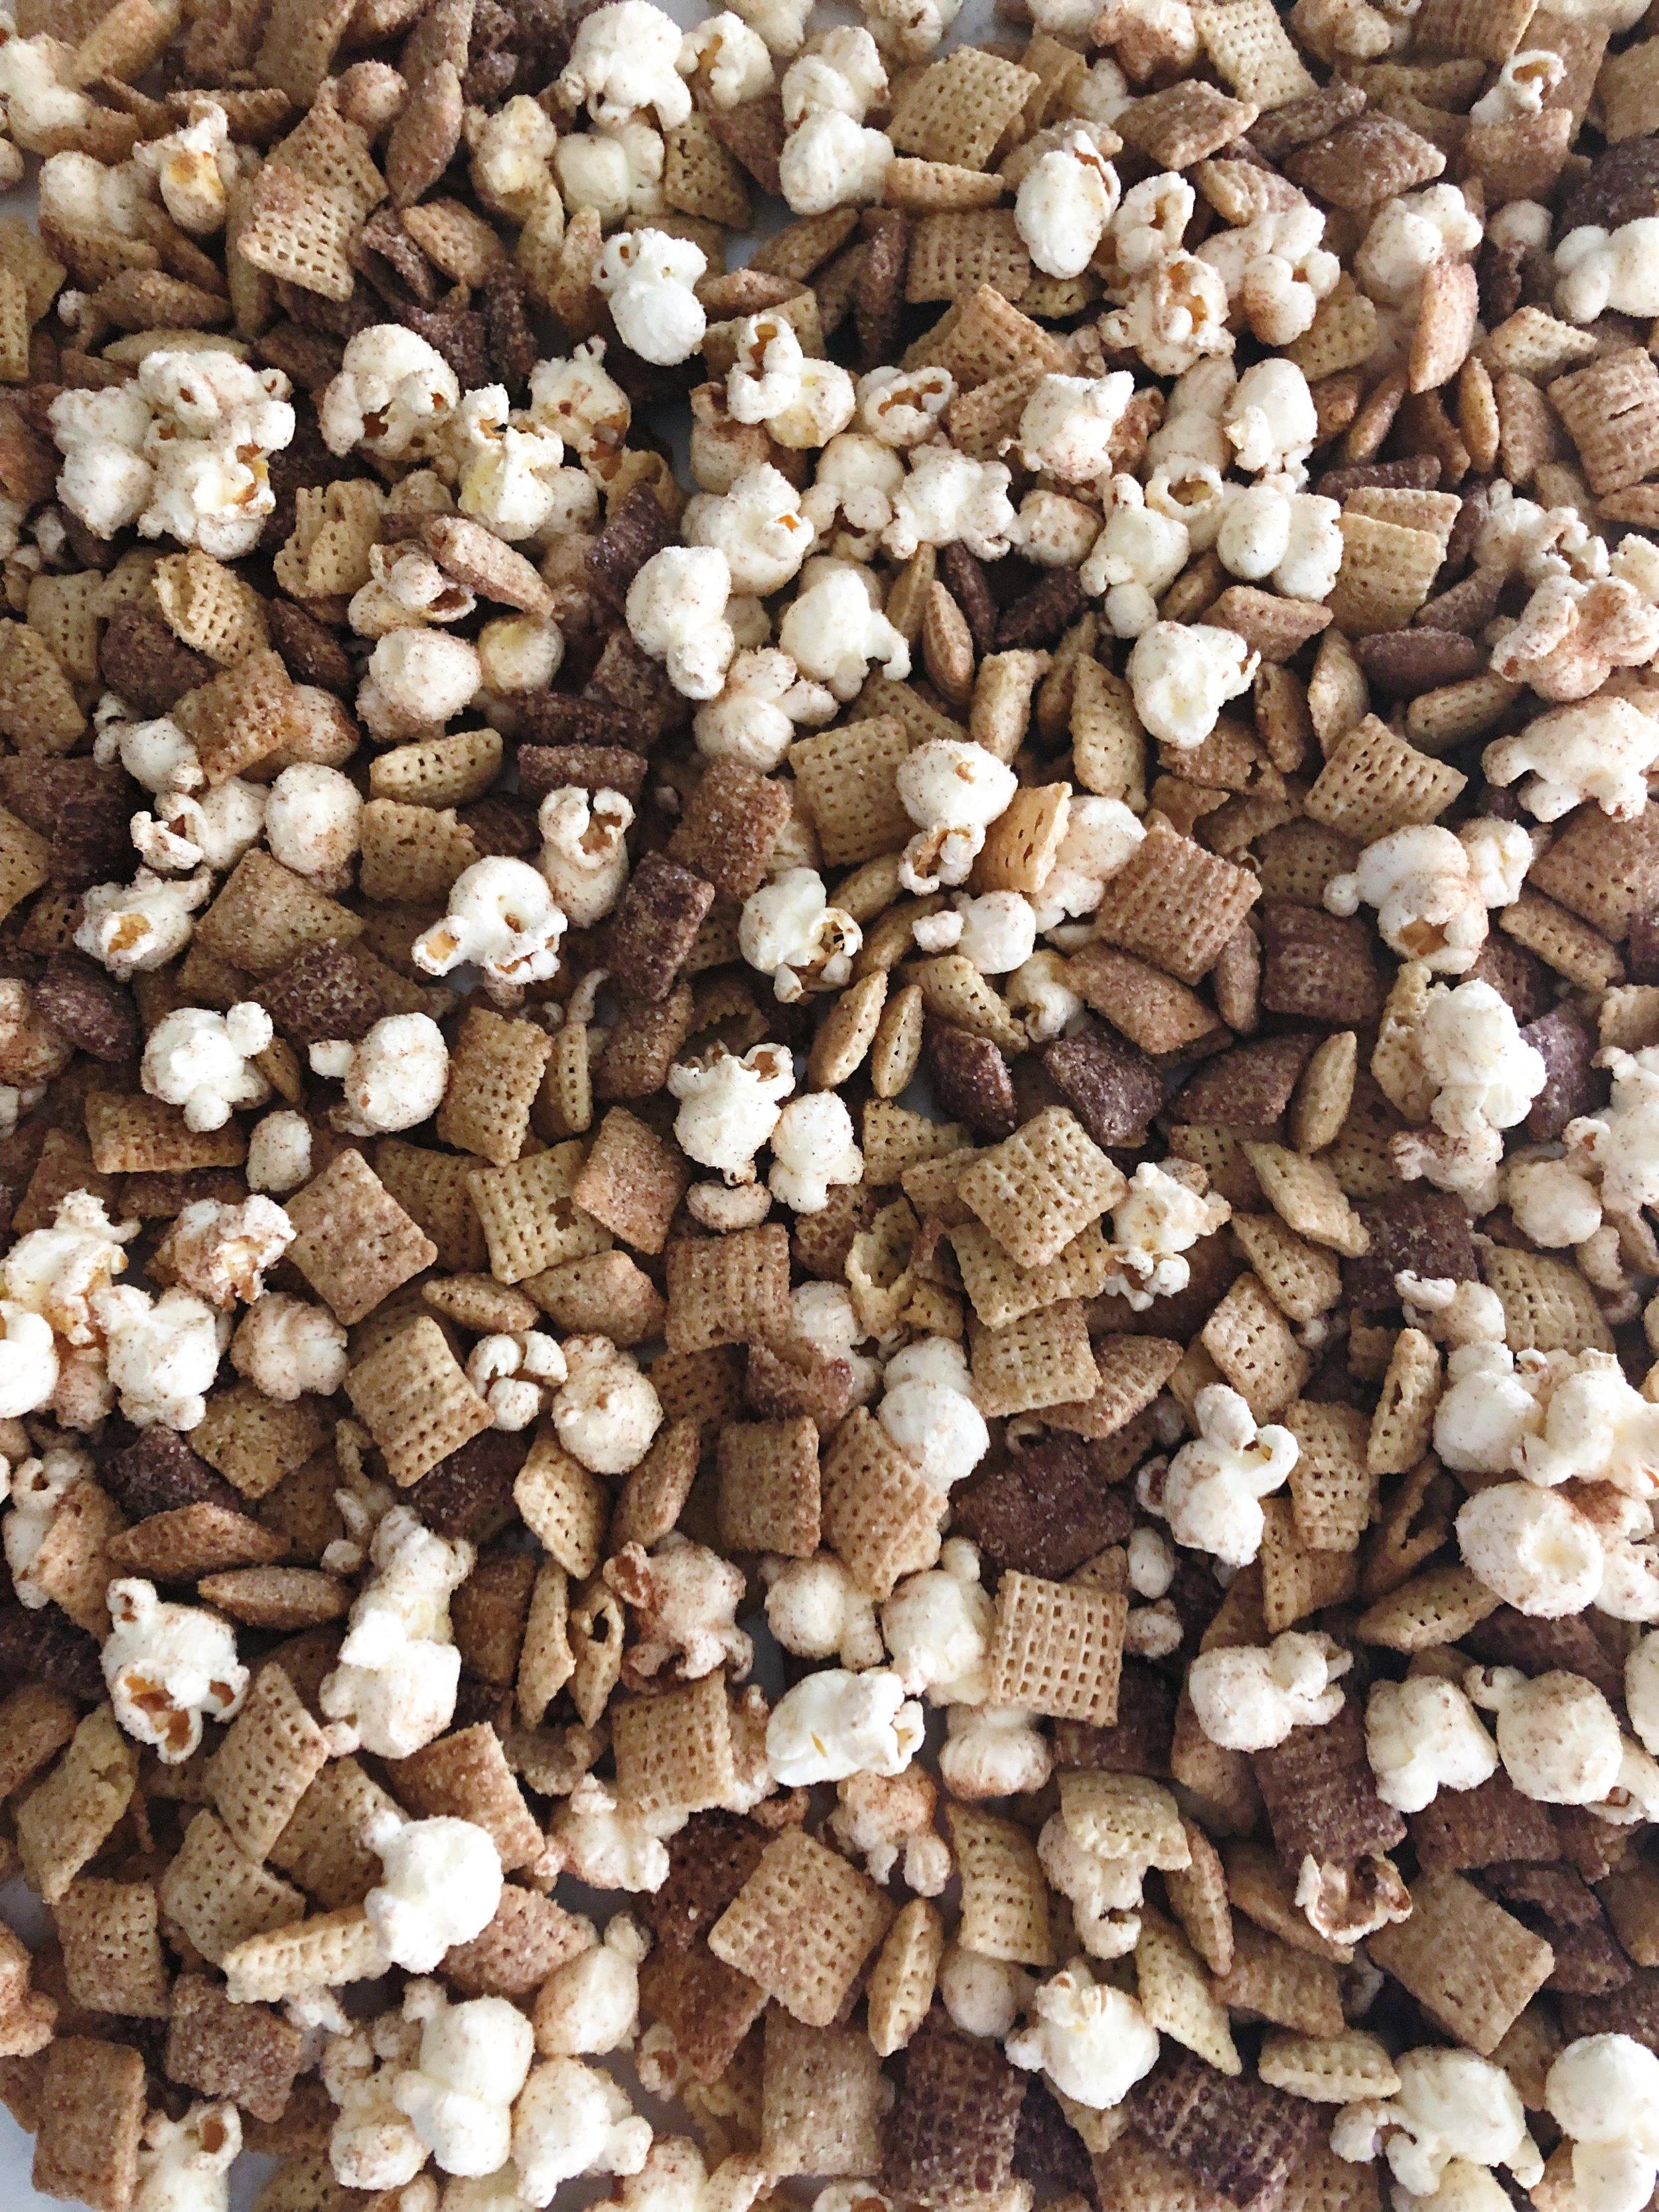 snickerdoodle-chex-cereal-popcorn-mix.JPG